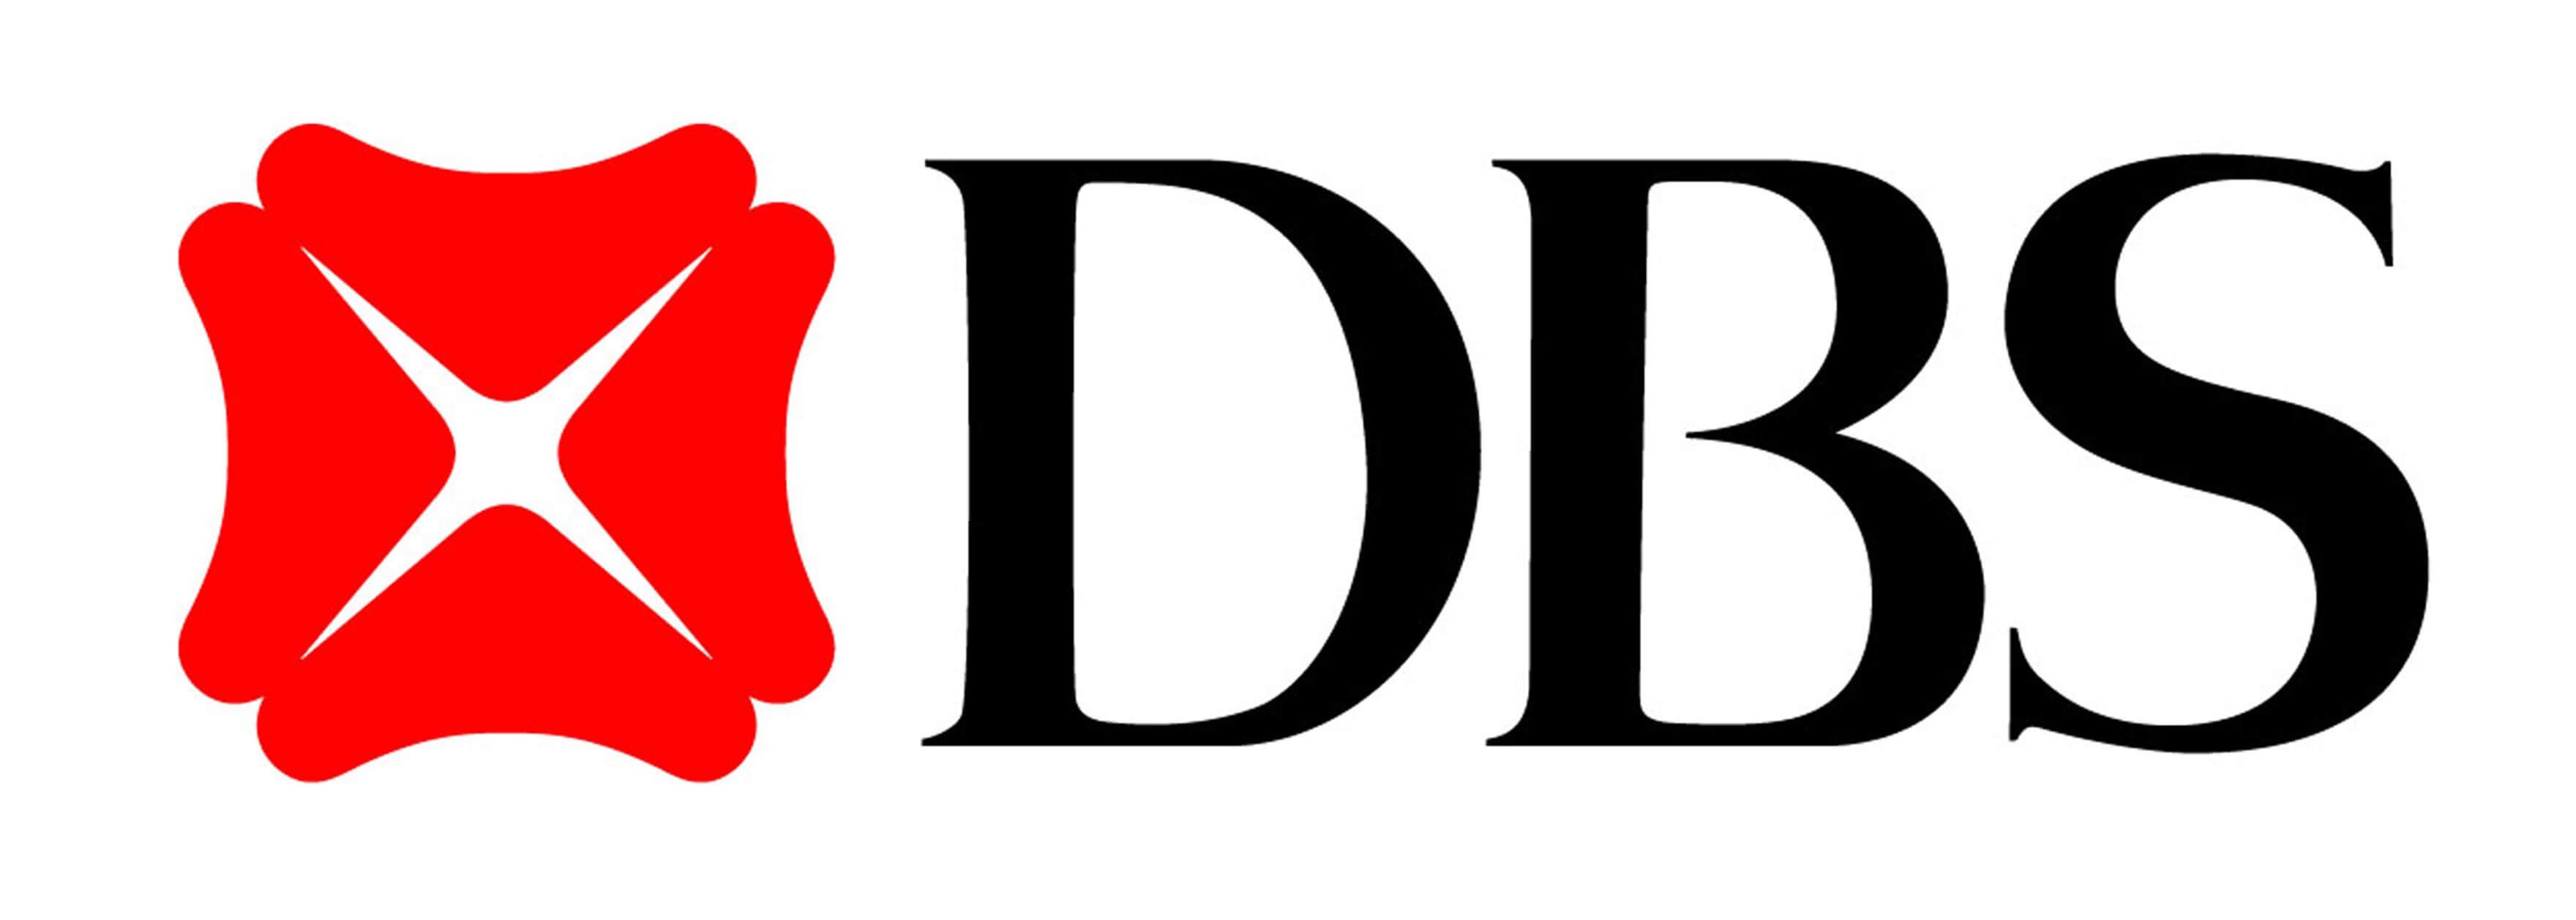 DBS Bank logo.